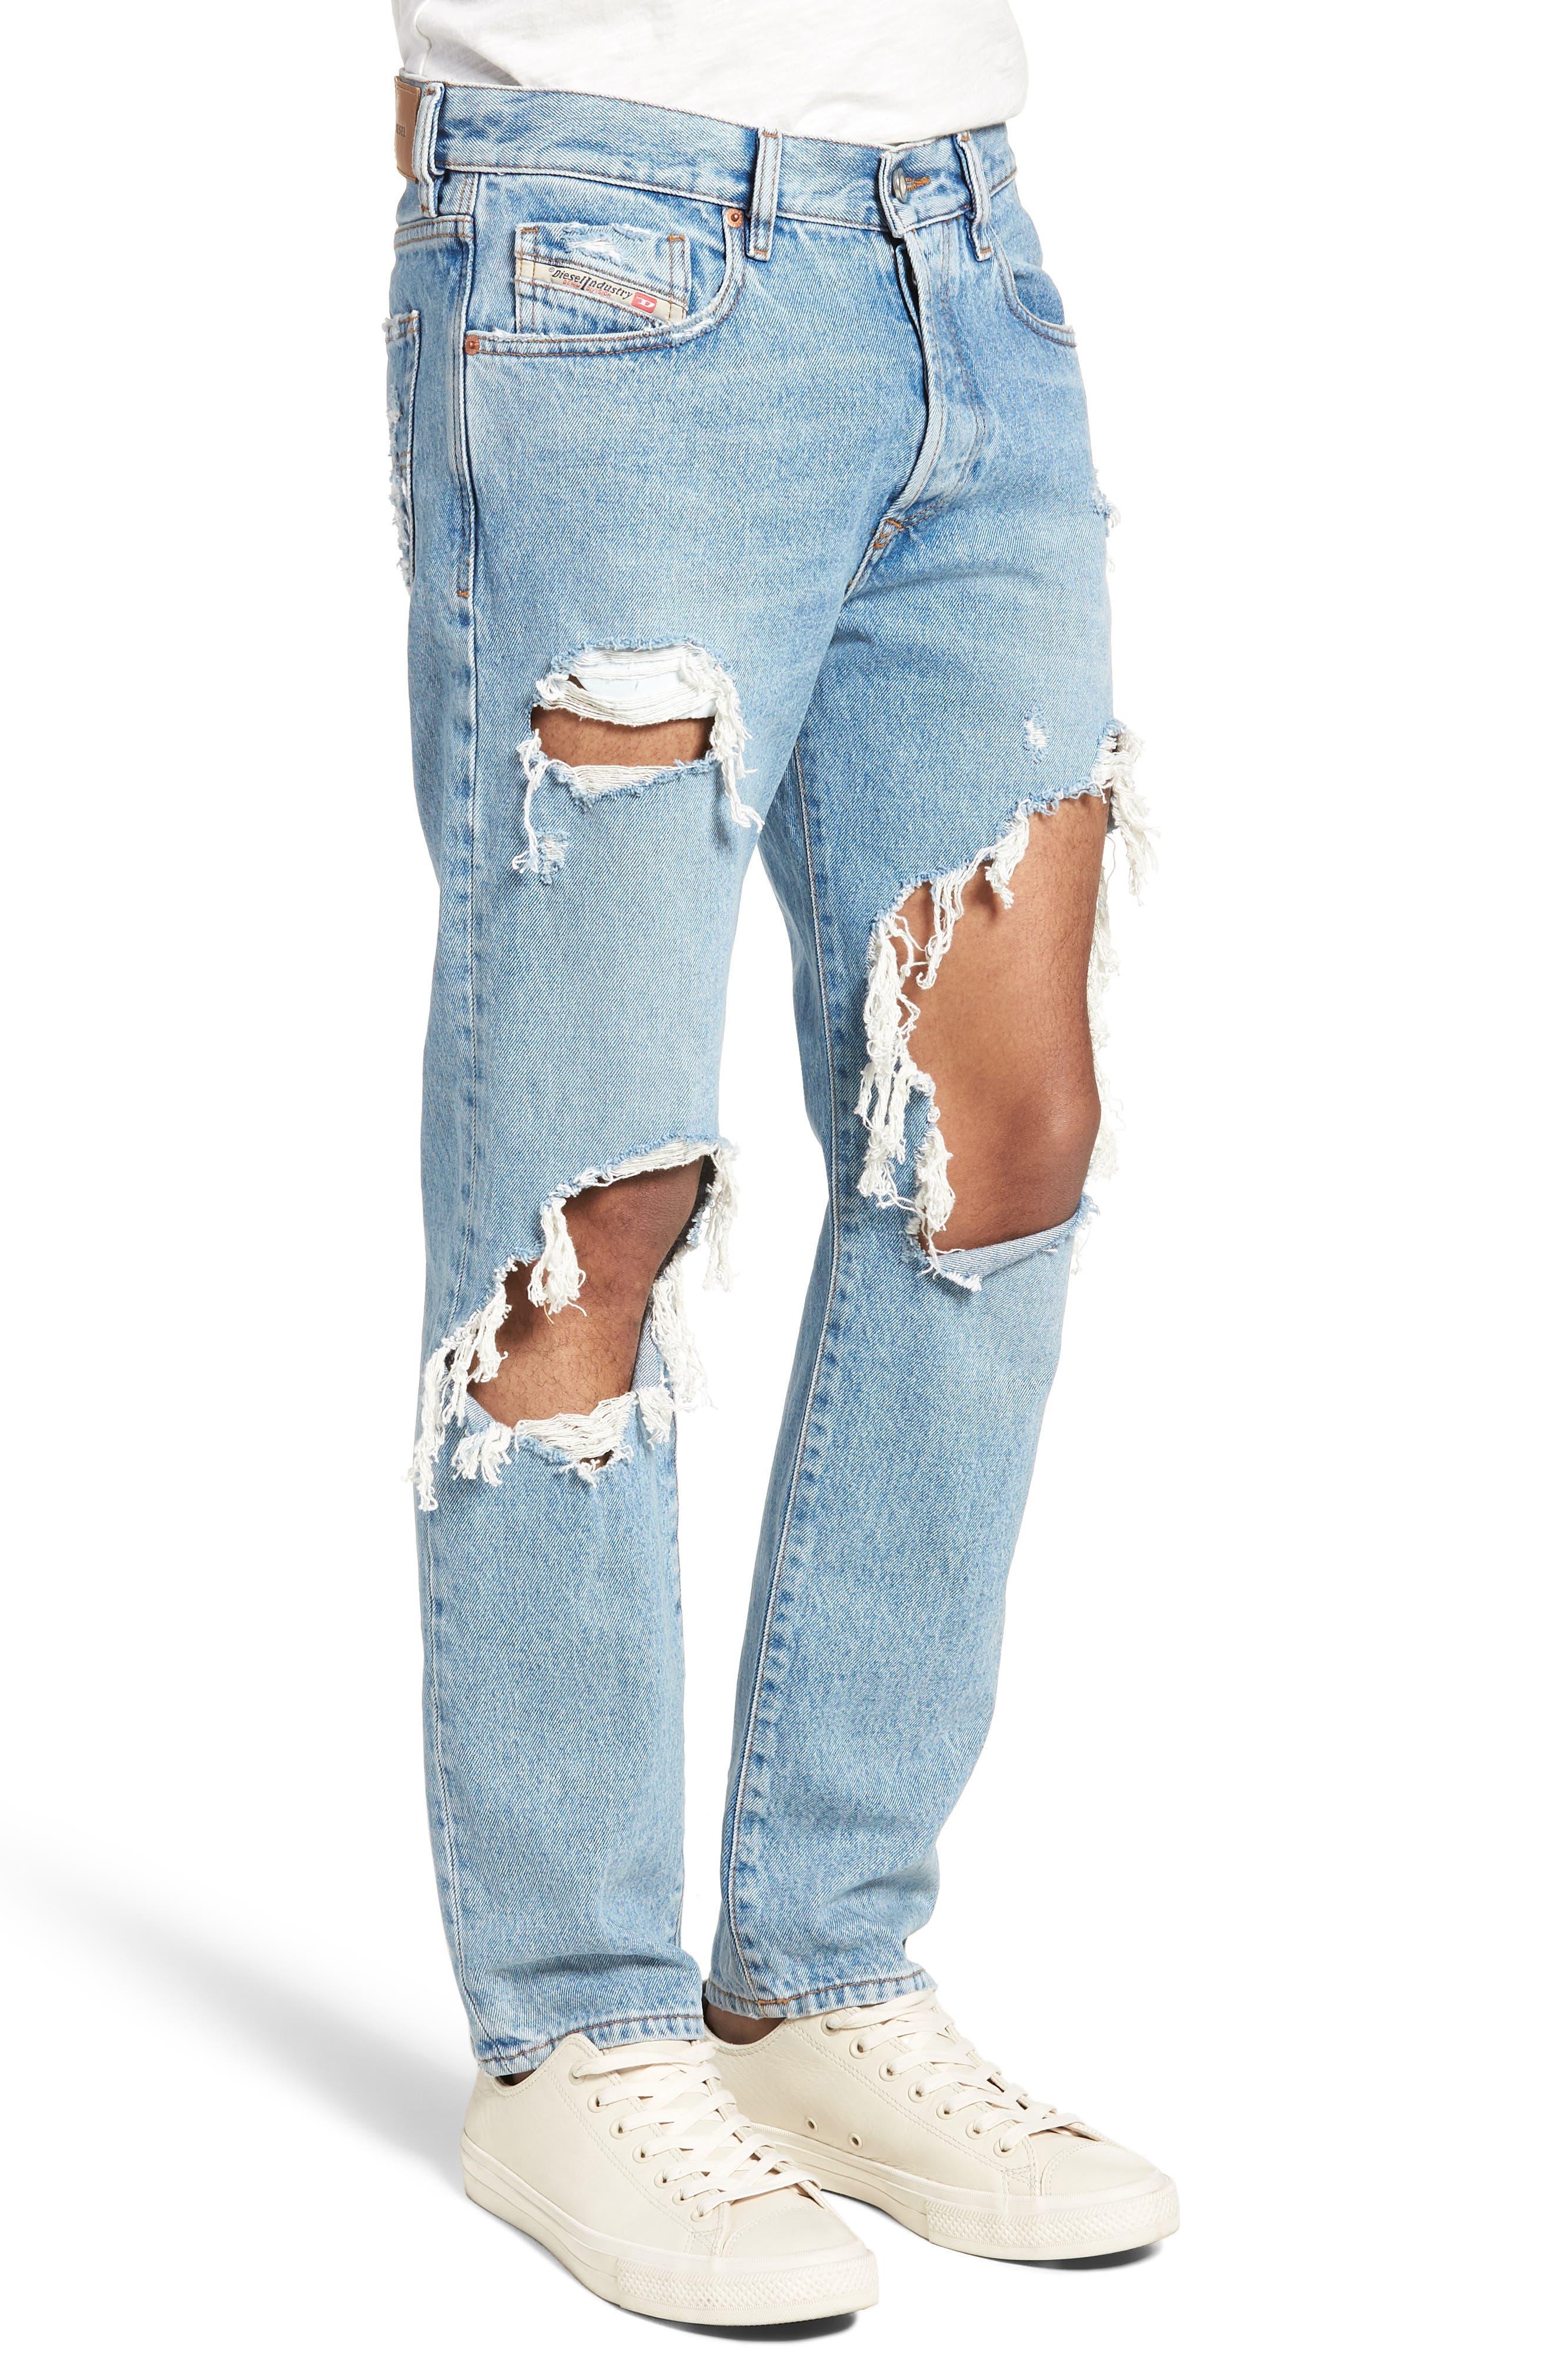 Mharky Slim Straight Leg Jeans,                             Alternate thumbnail 3, color,                             0076M